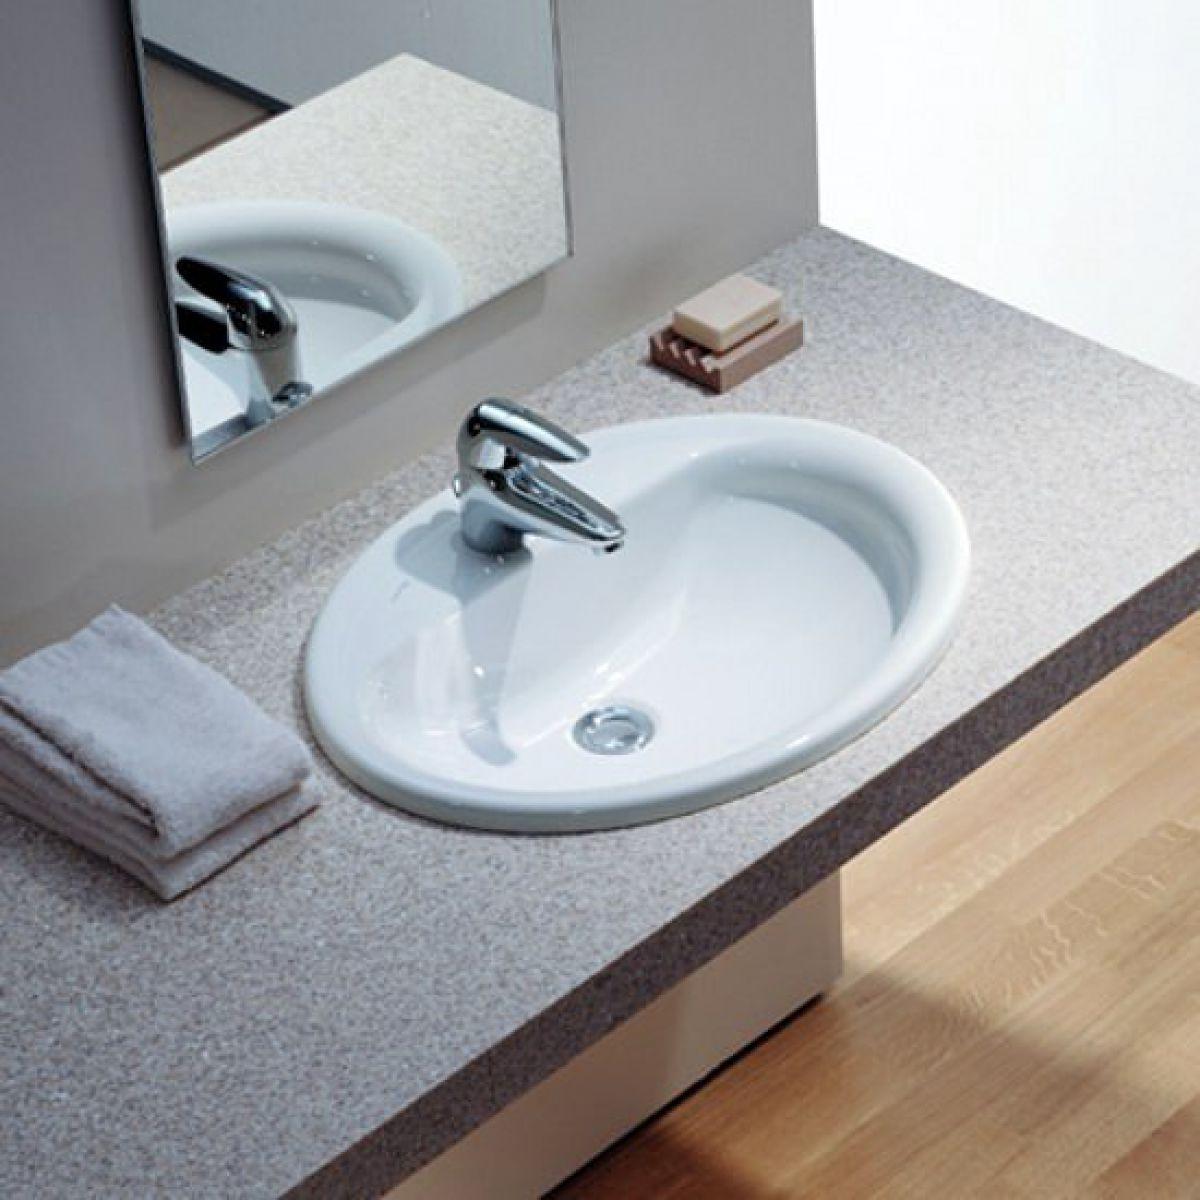 laufen pro b drop in washbasin uk bathrooms. Black Bedroom Furniture Sets. Home Design Ideas